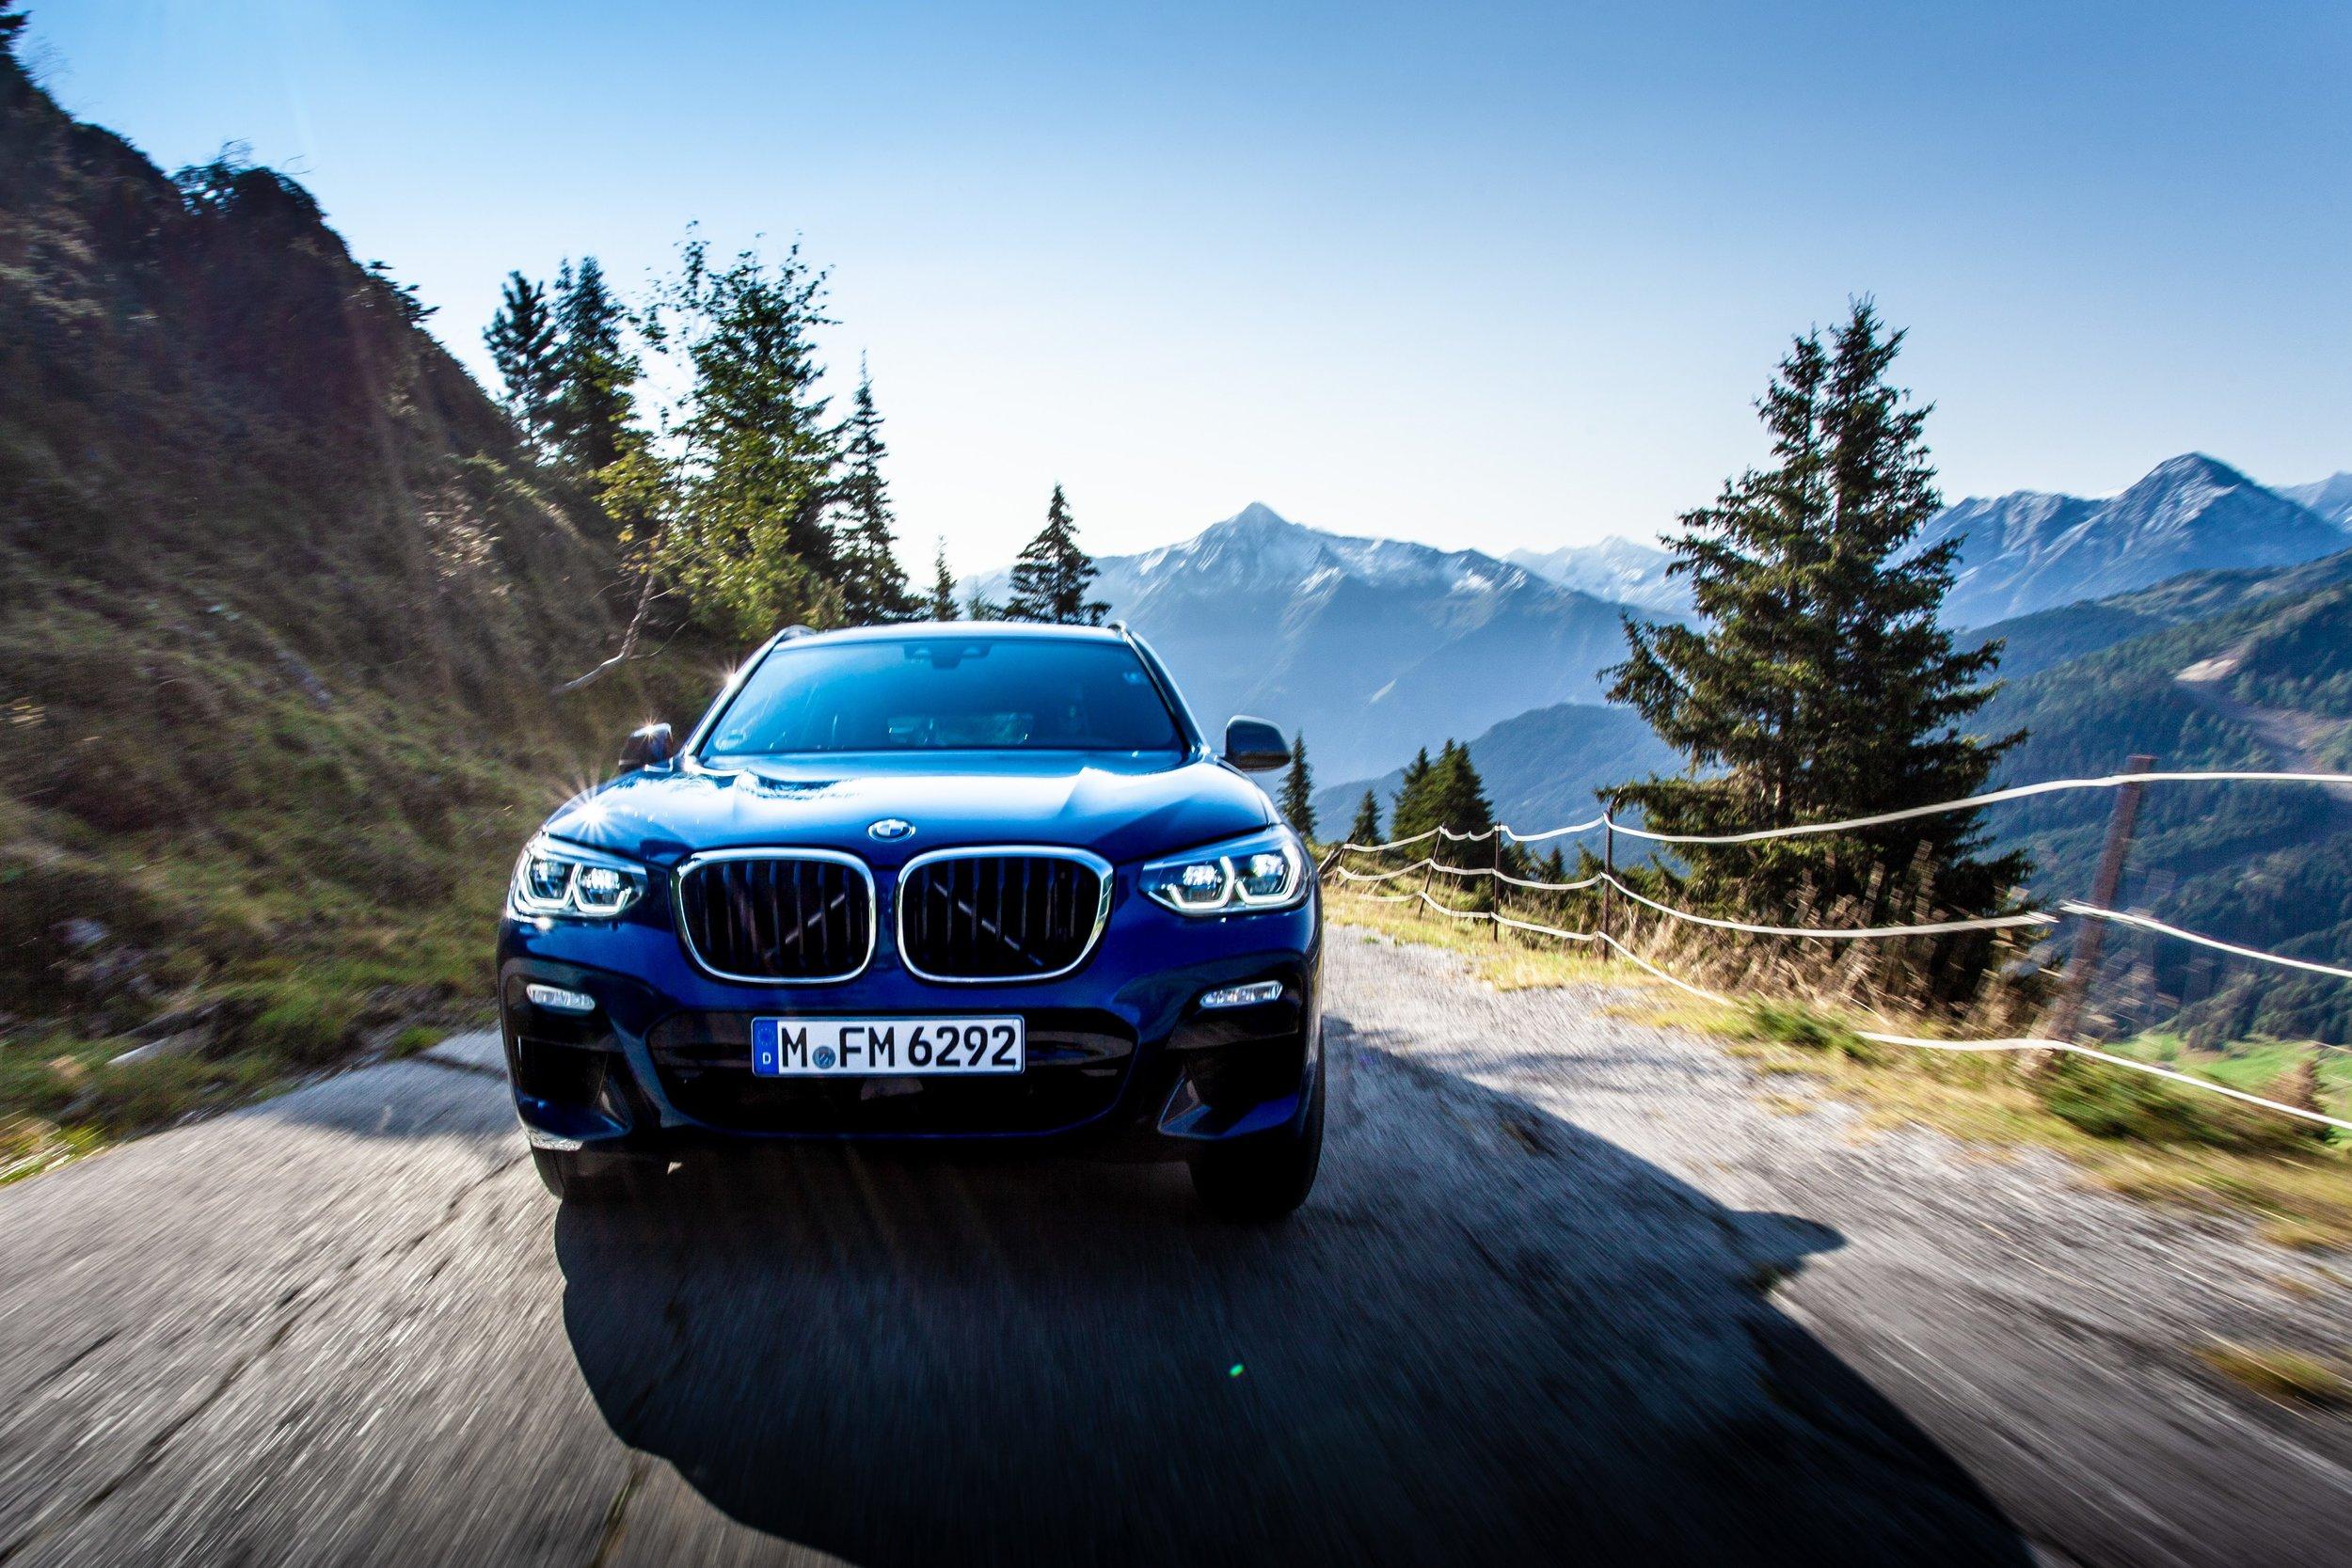 BMW_Mountains_Zillertal_2018_Day2-5403.jpg